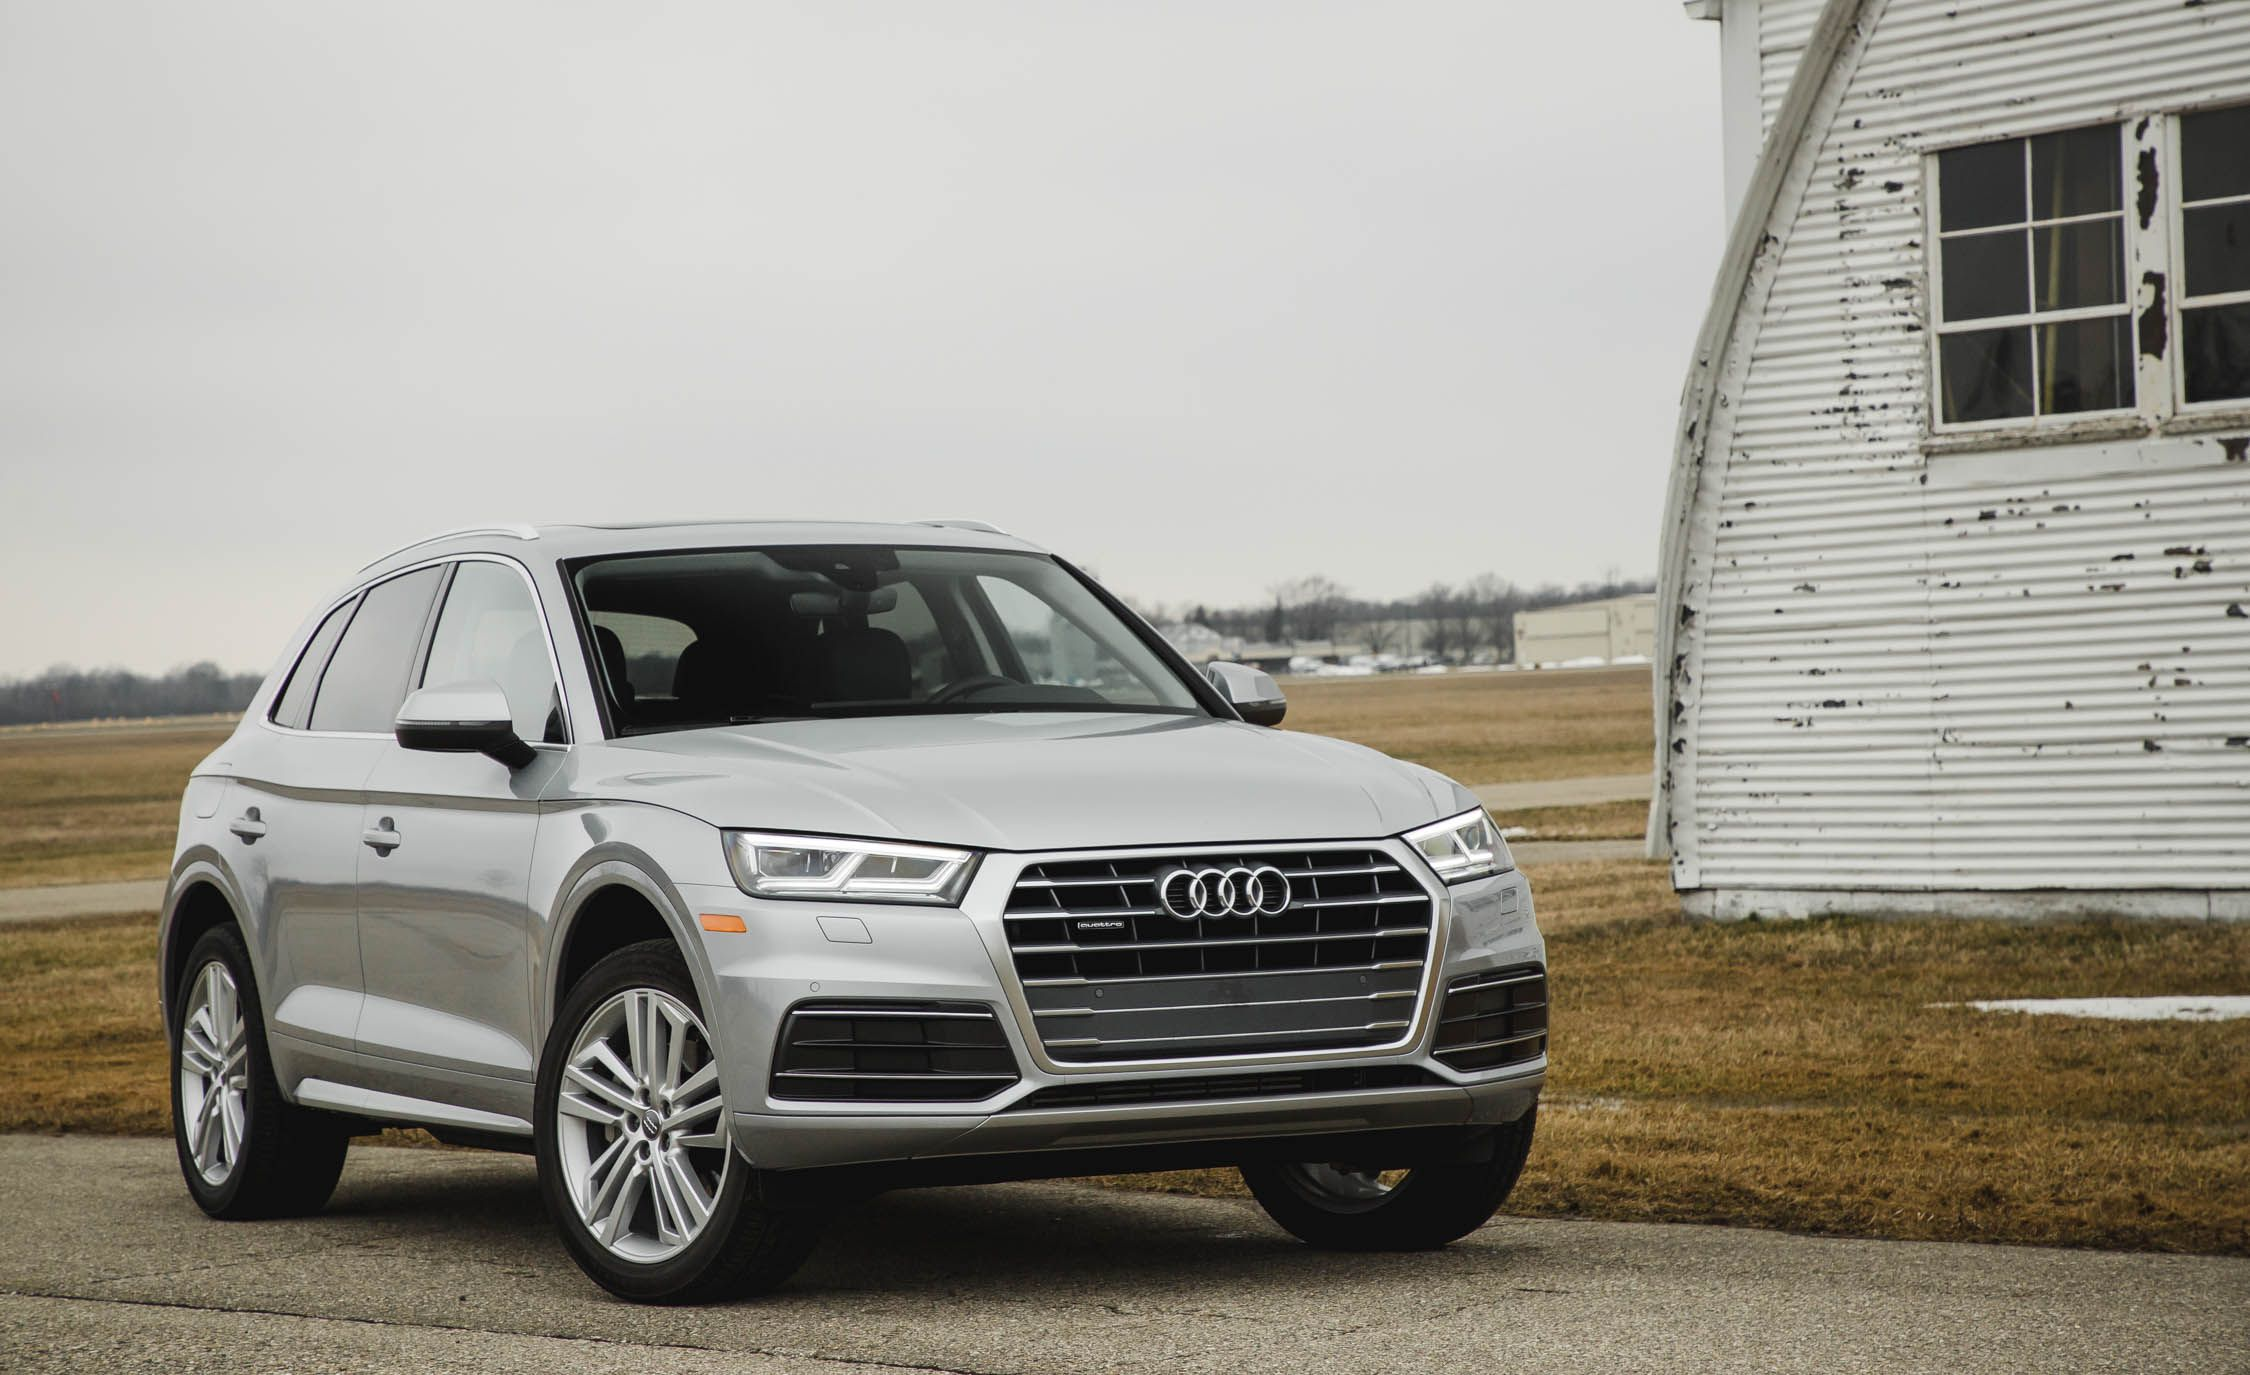 Audi Q Reviews Audi Q Price Photos And Specs Car And Driver - Audi q5